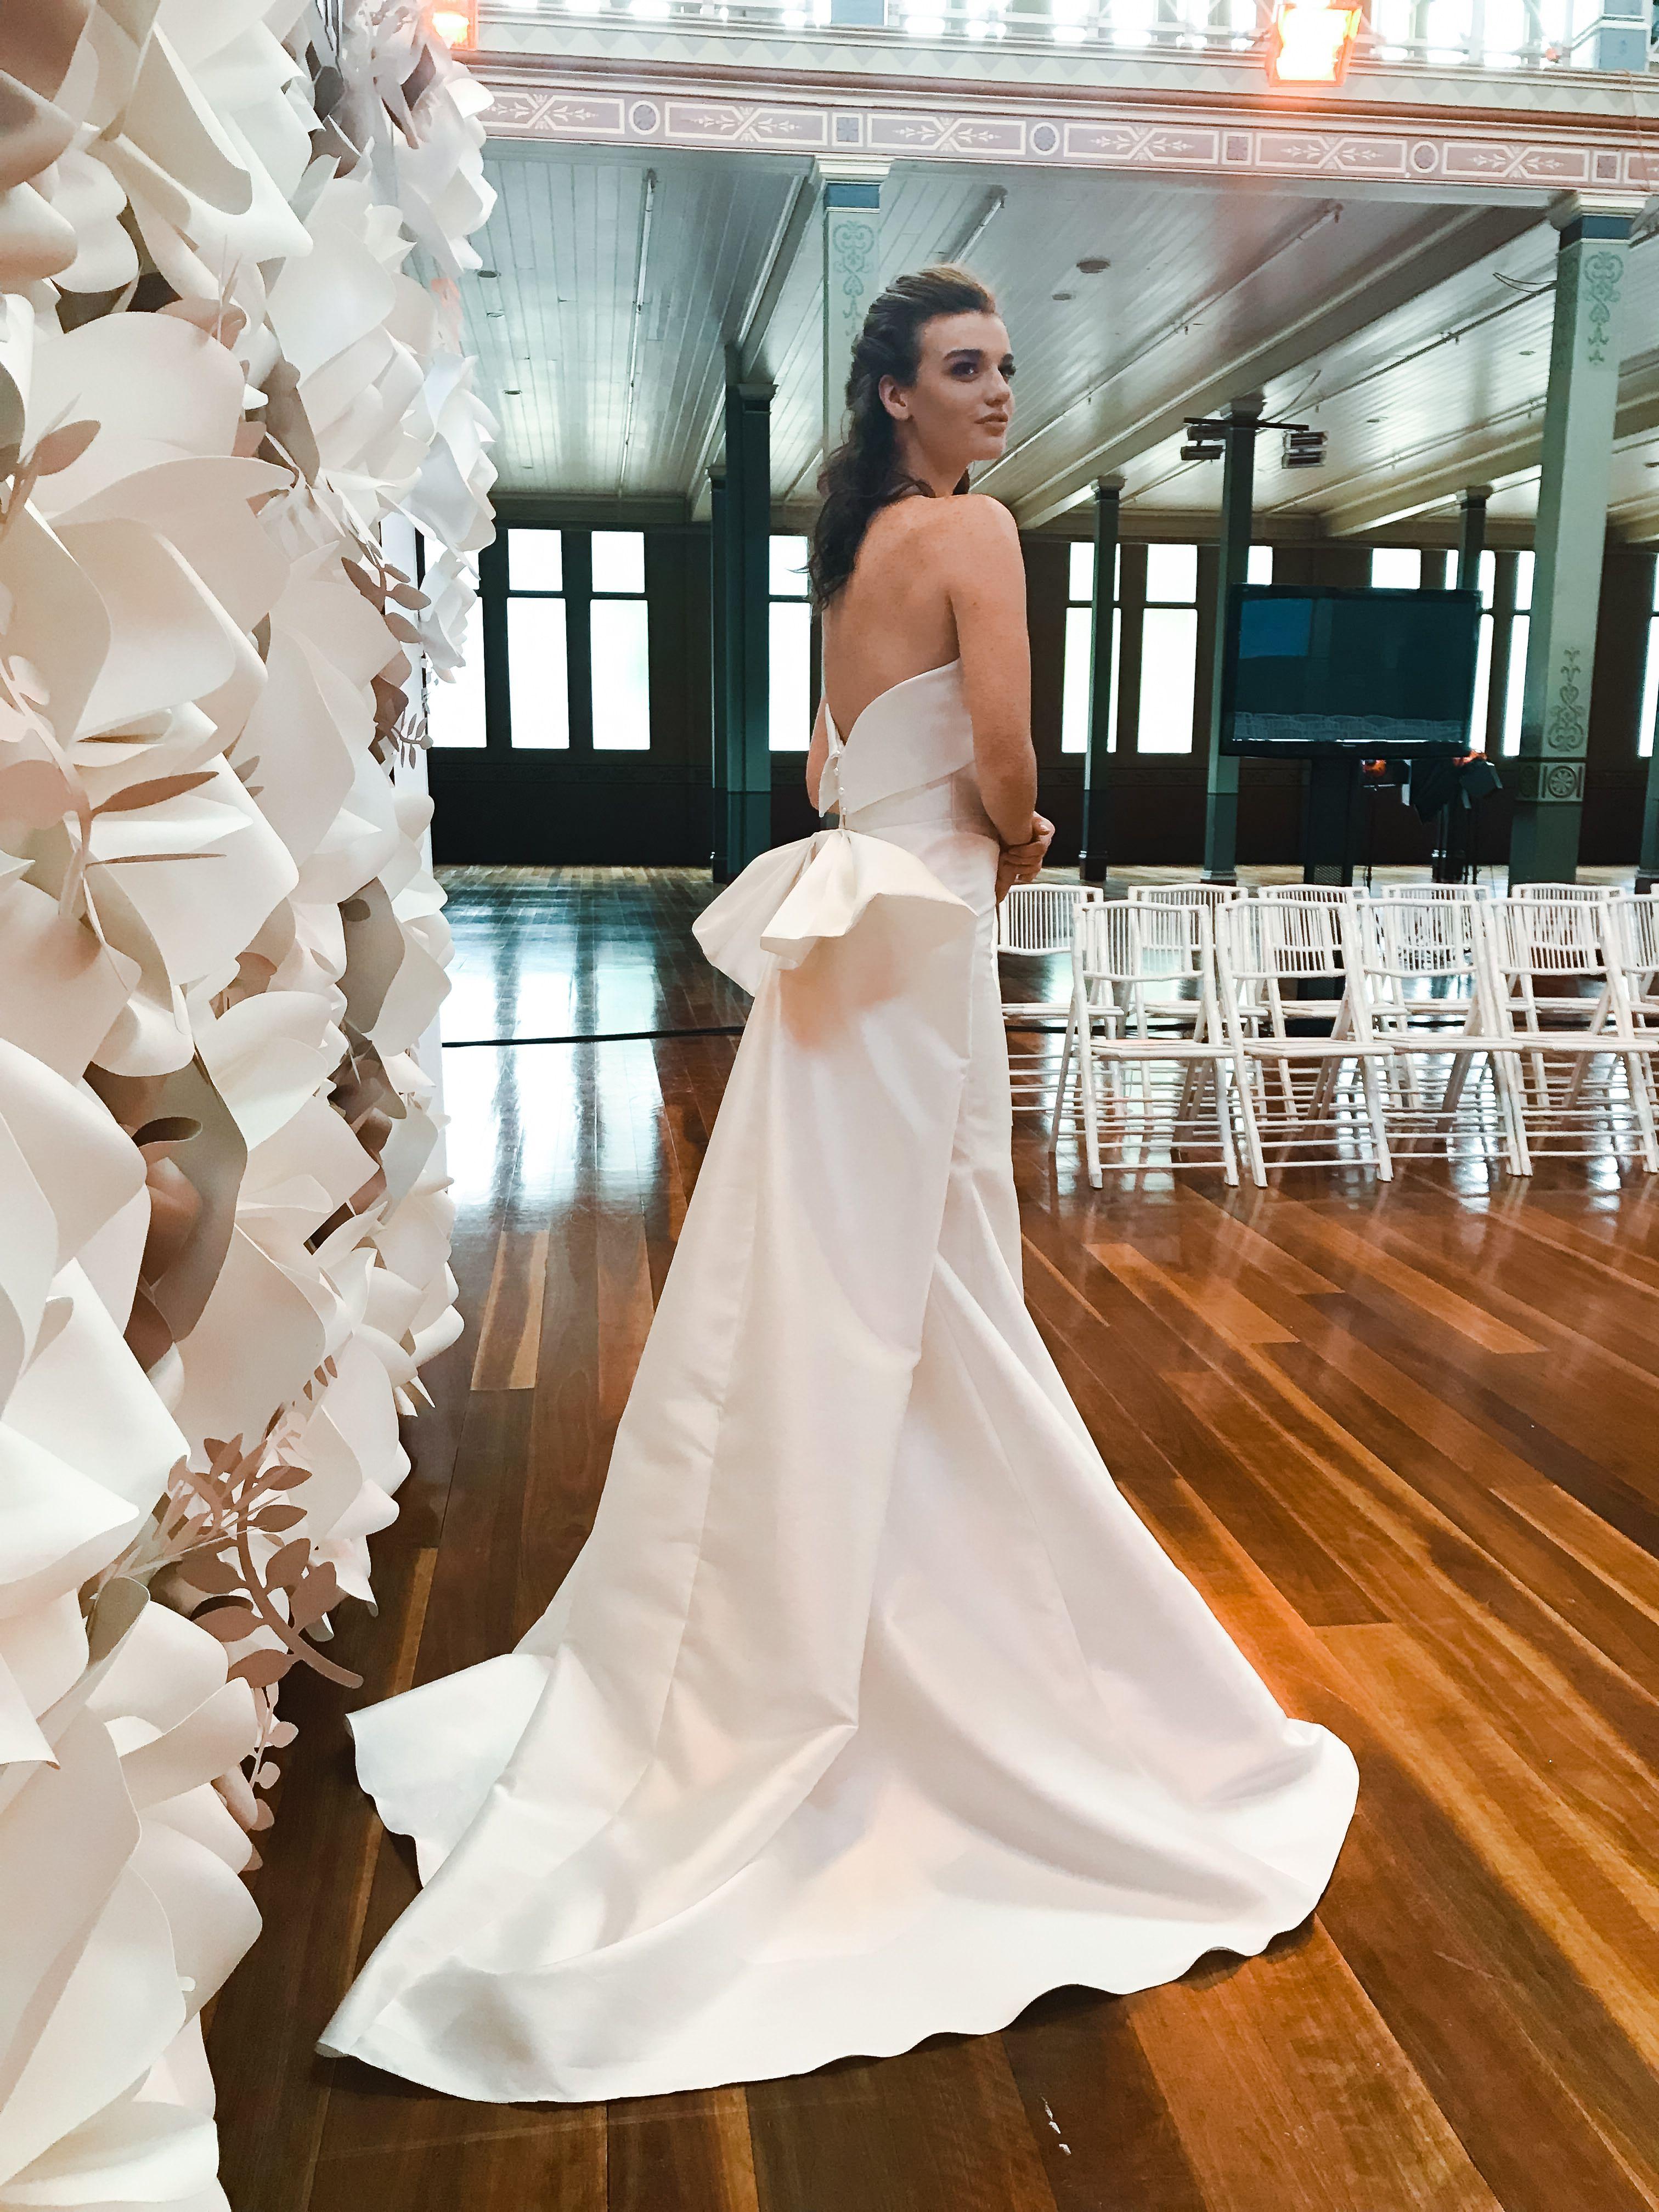 Our brand new 'Akira' Gown  #wedding #shehzarinbathacouture